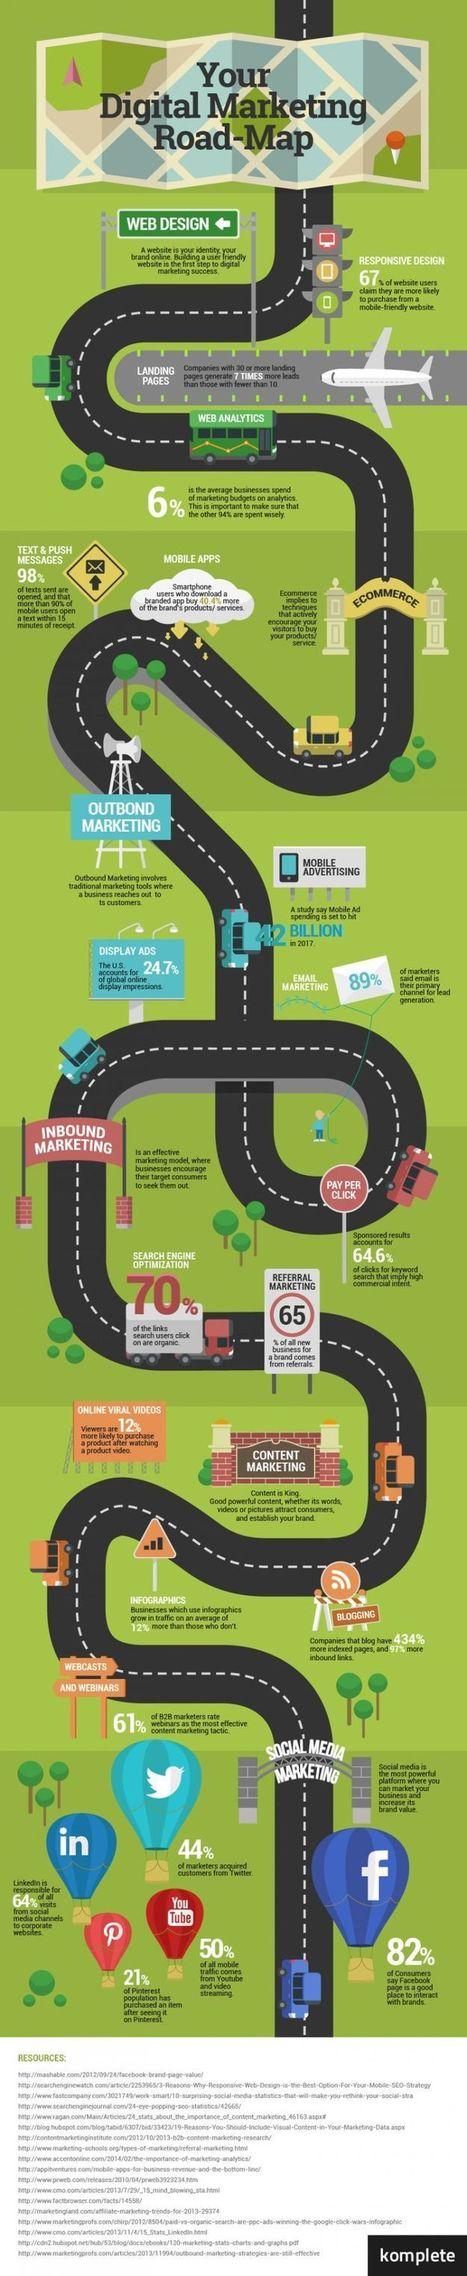 Infographic: Your Digital Marketing Roadmap   The Meeddya Group   Scoop.it